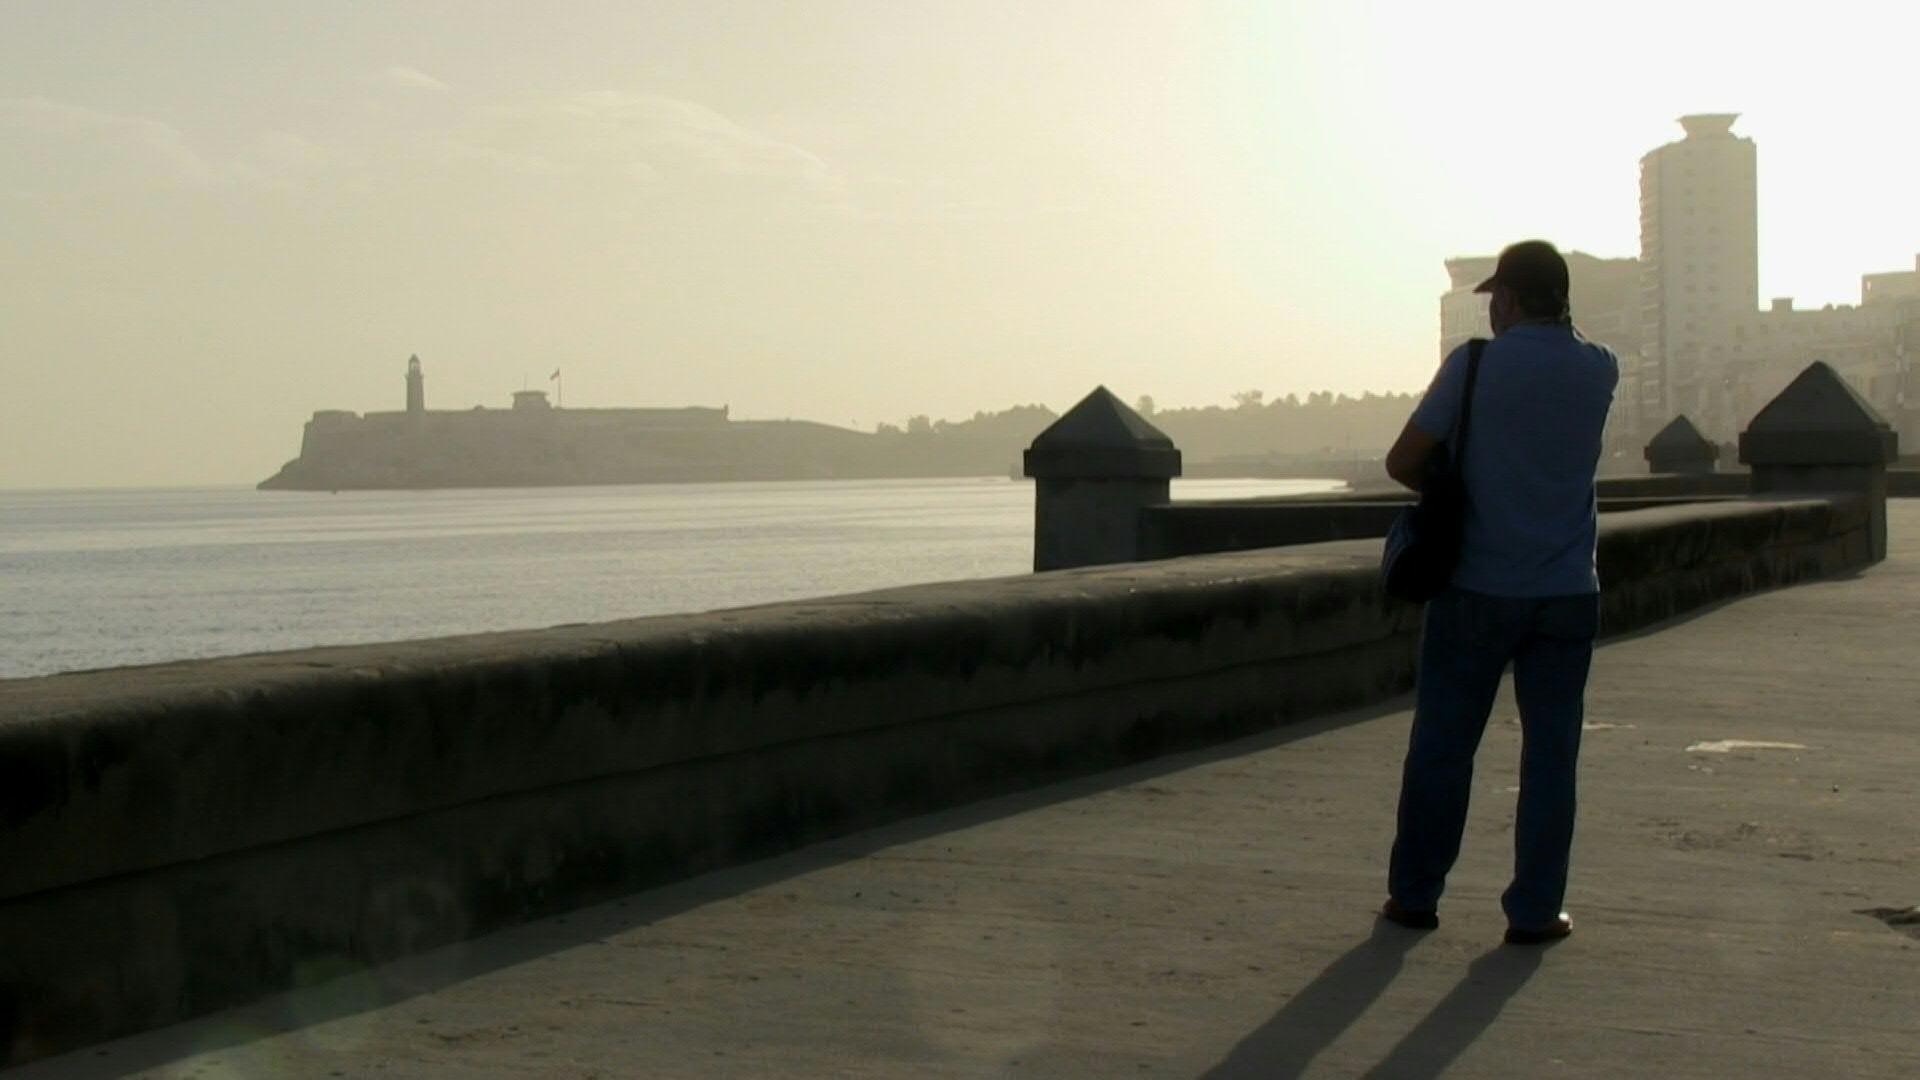 Enorme nube de polvo oscurece a Cuba